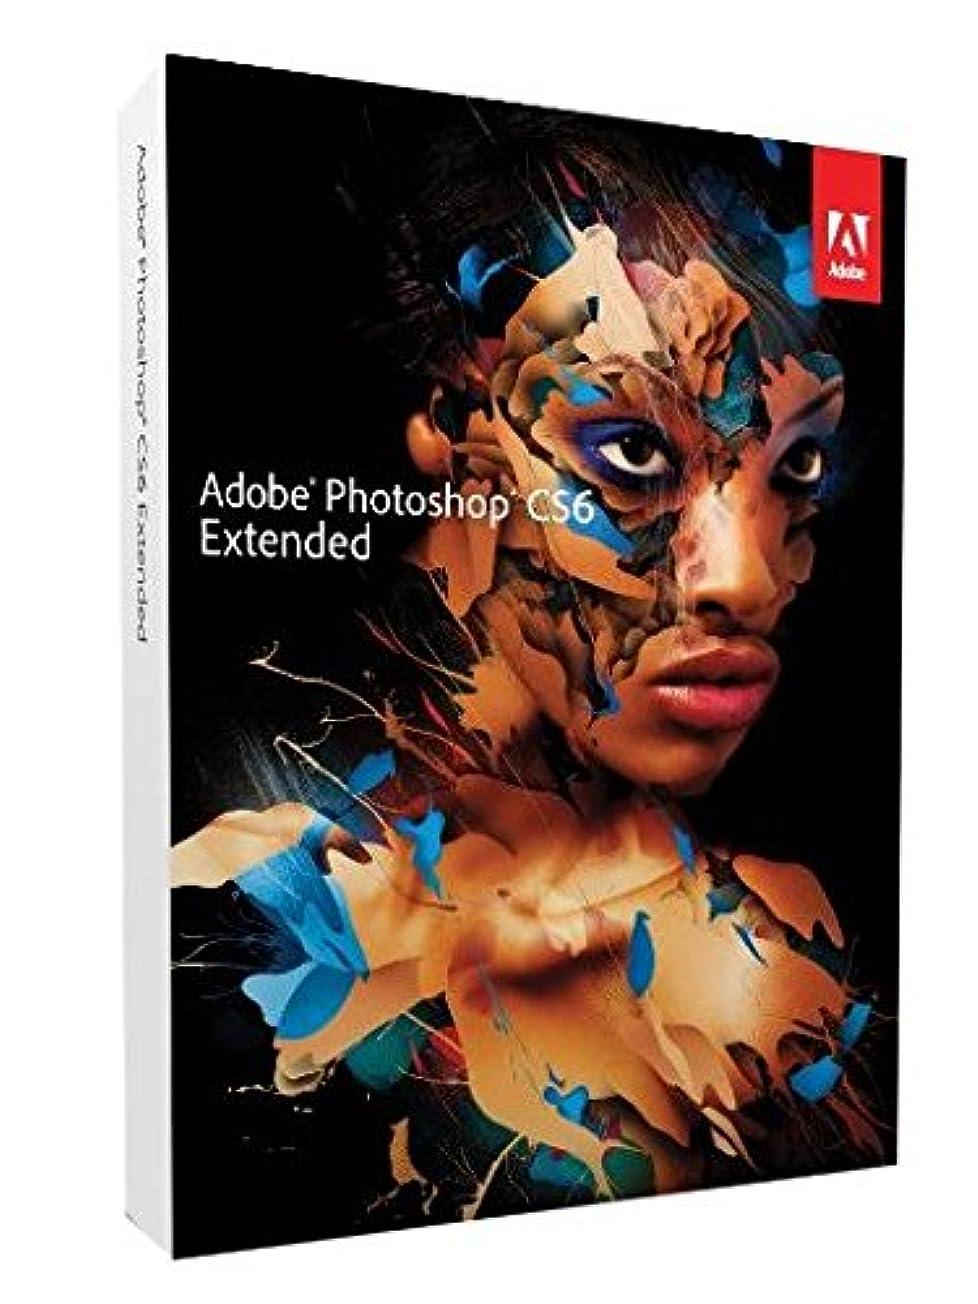 組み込む論理的に連隊Adobe Photoshop CS6 Extended Windows用 photoshop Win版